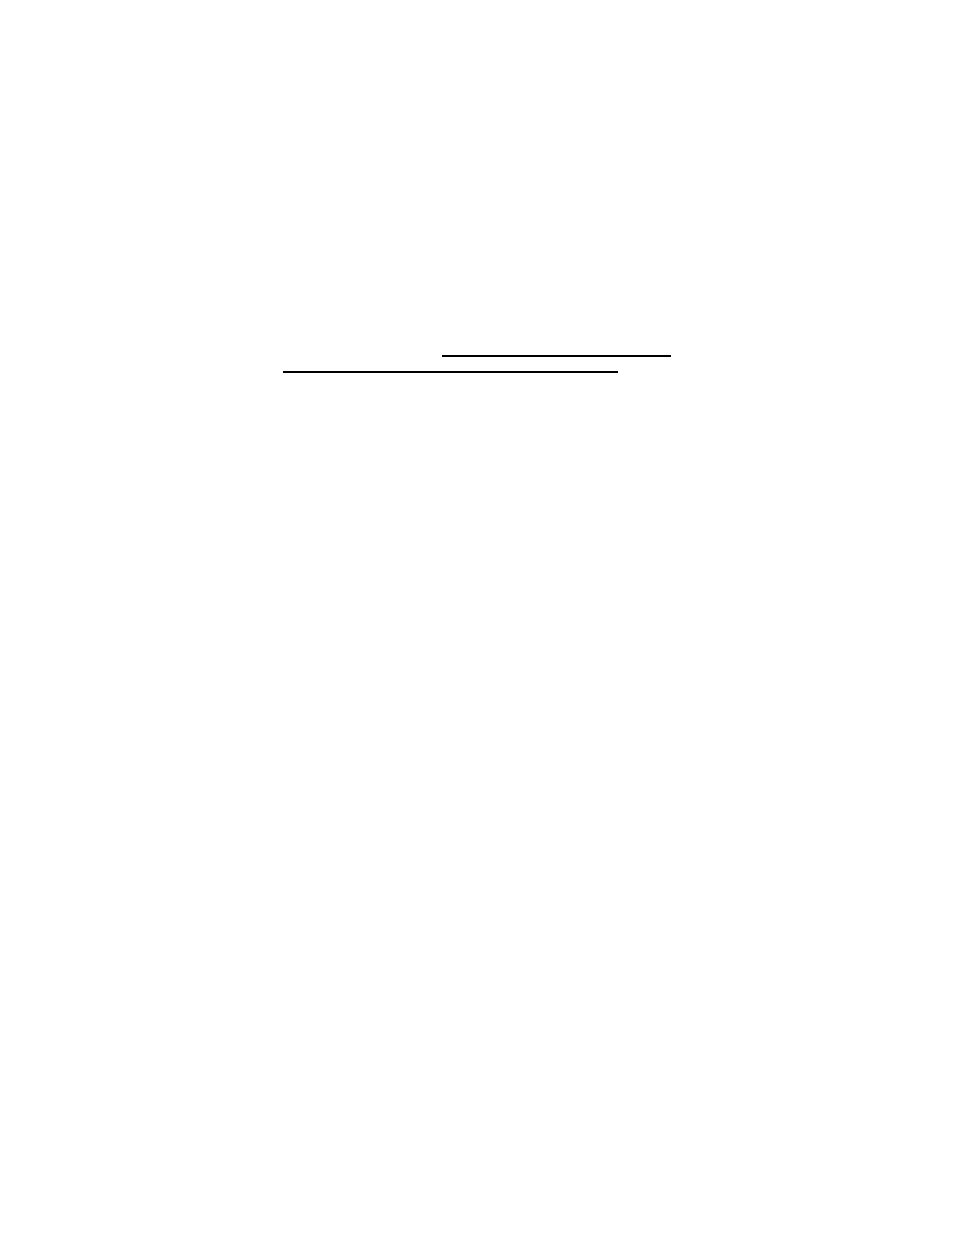 Black Interior Accessories mcouc GrabTray Passenger Storage Tray Organizer Grab Handle Accessory Box for 2011-2018 Jeep Wrangler JK JKU 2-door//4-door